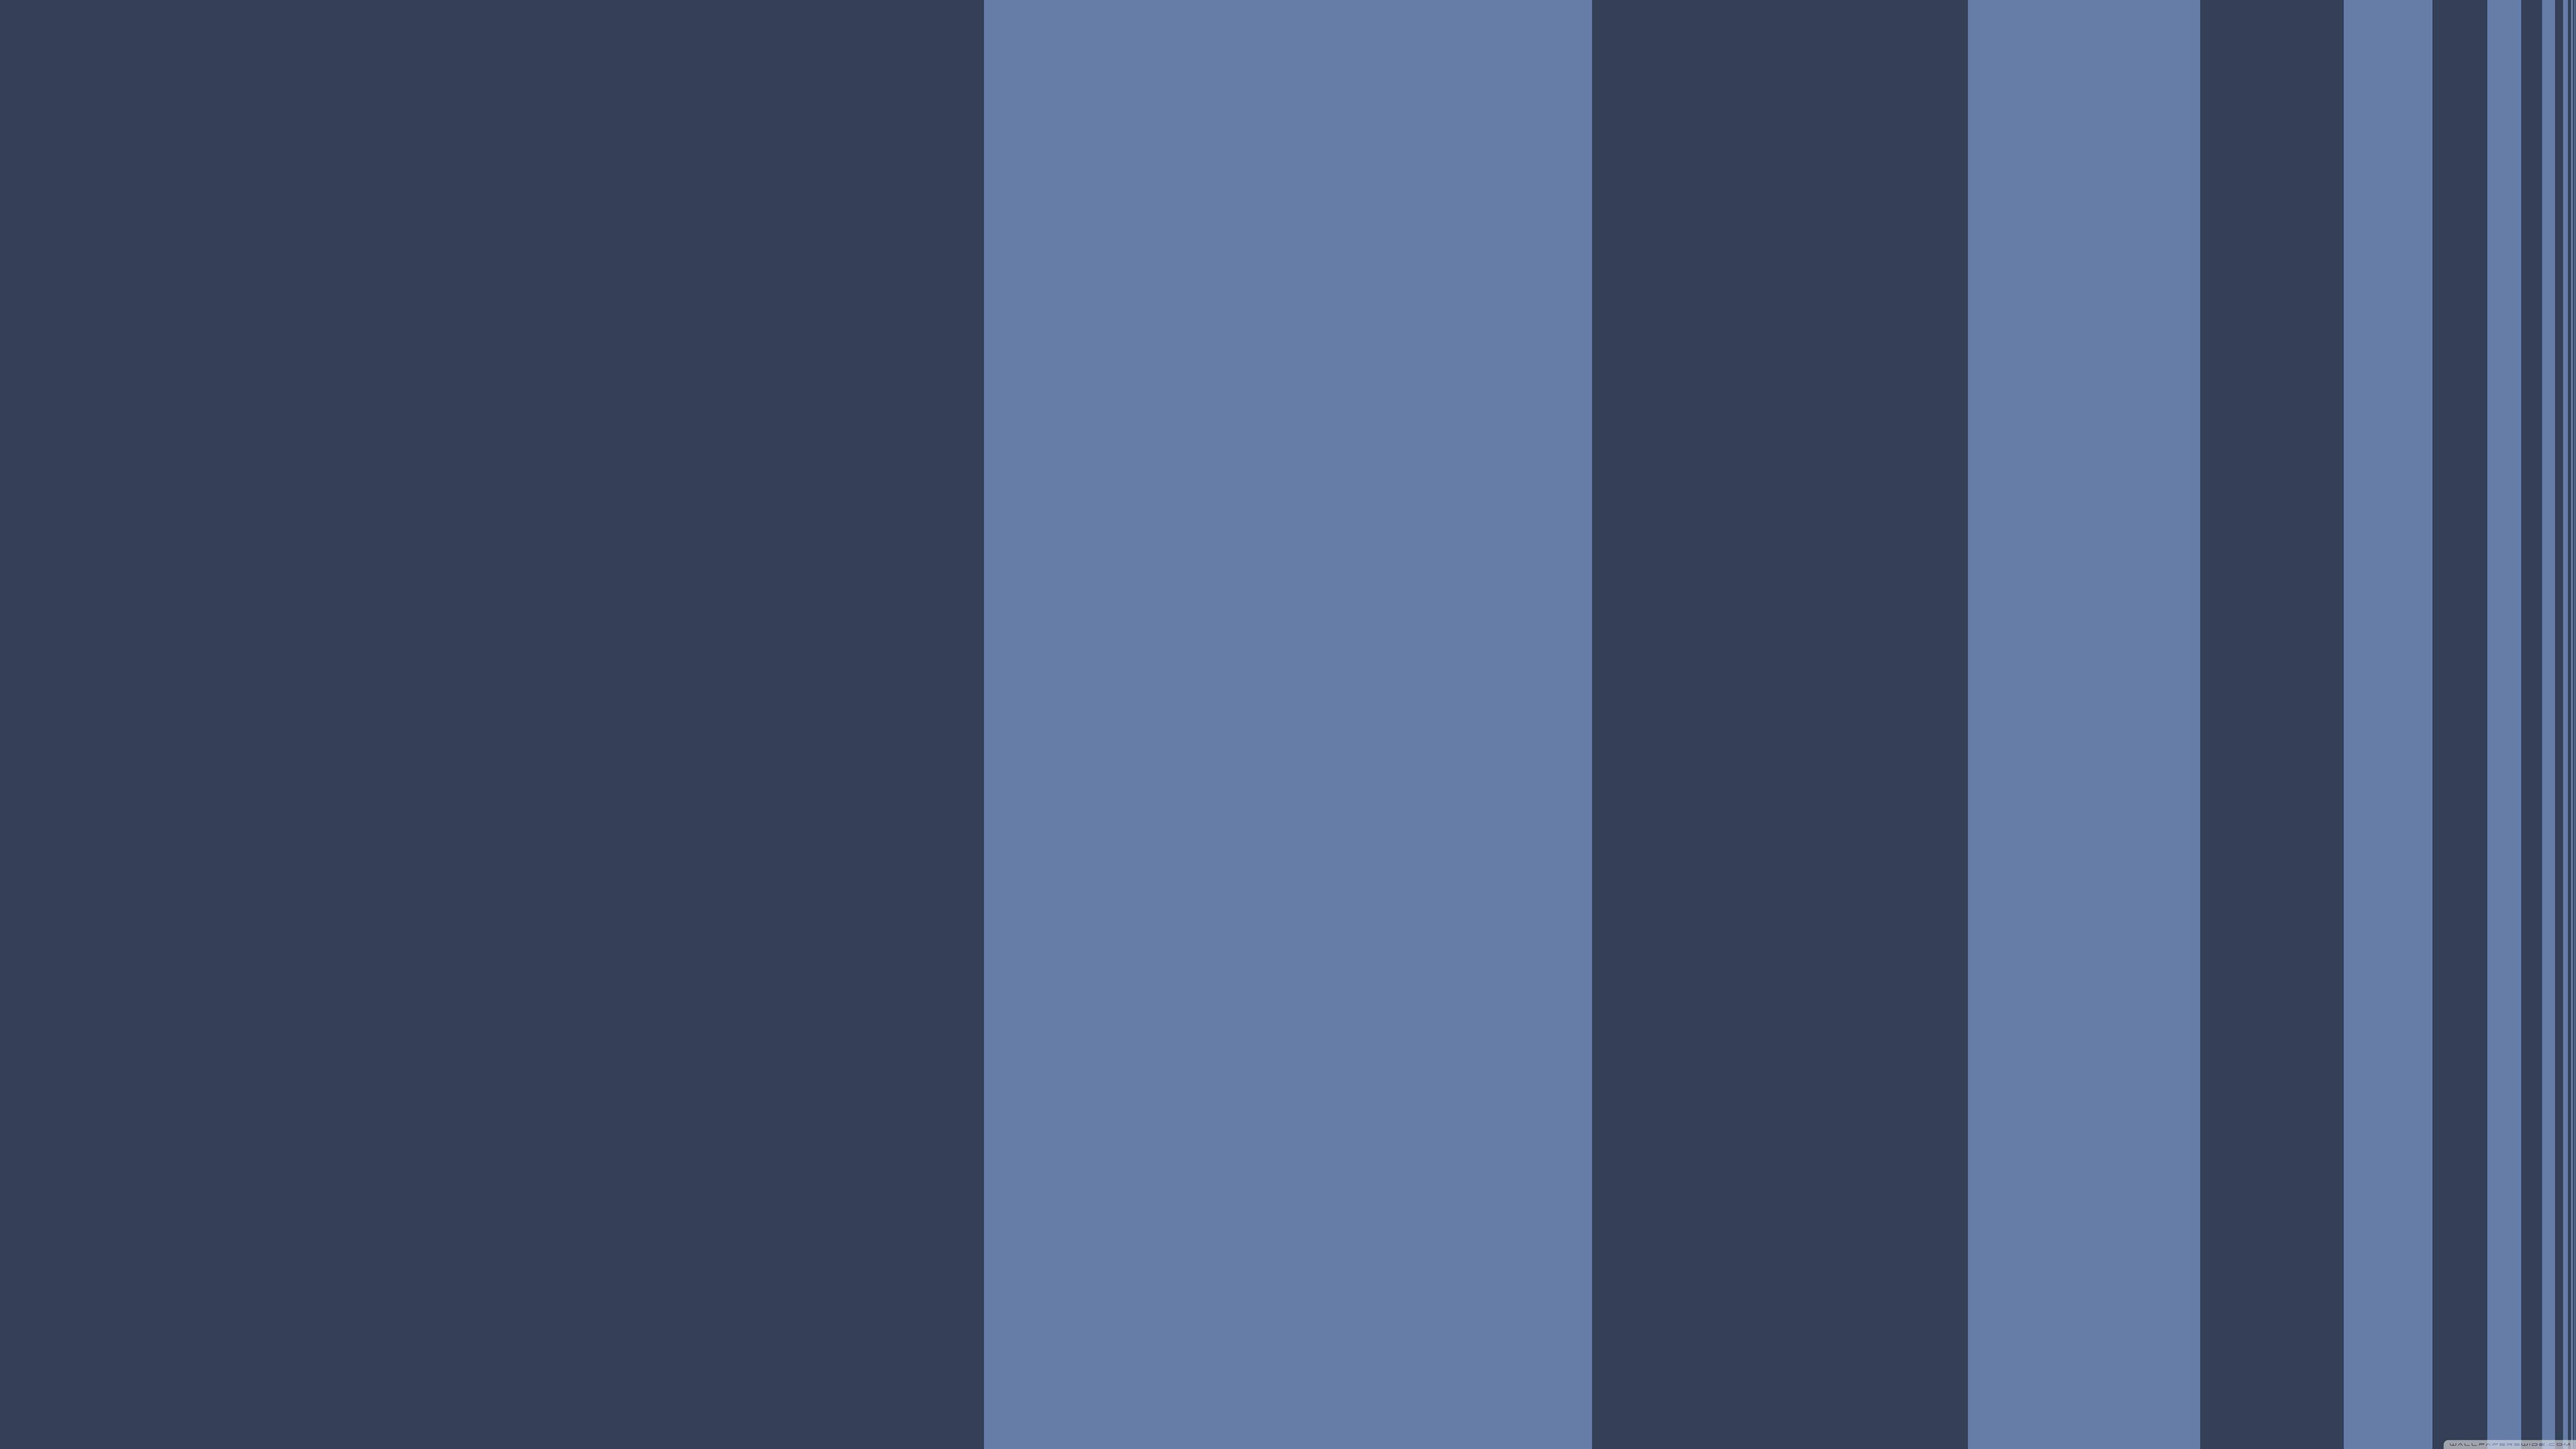 fibonacci uhd 8k wallpaper-